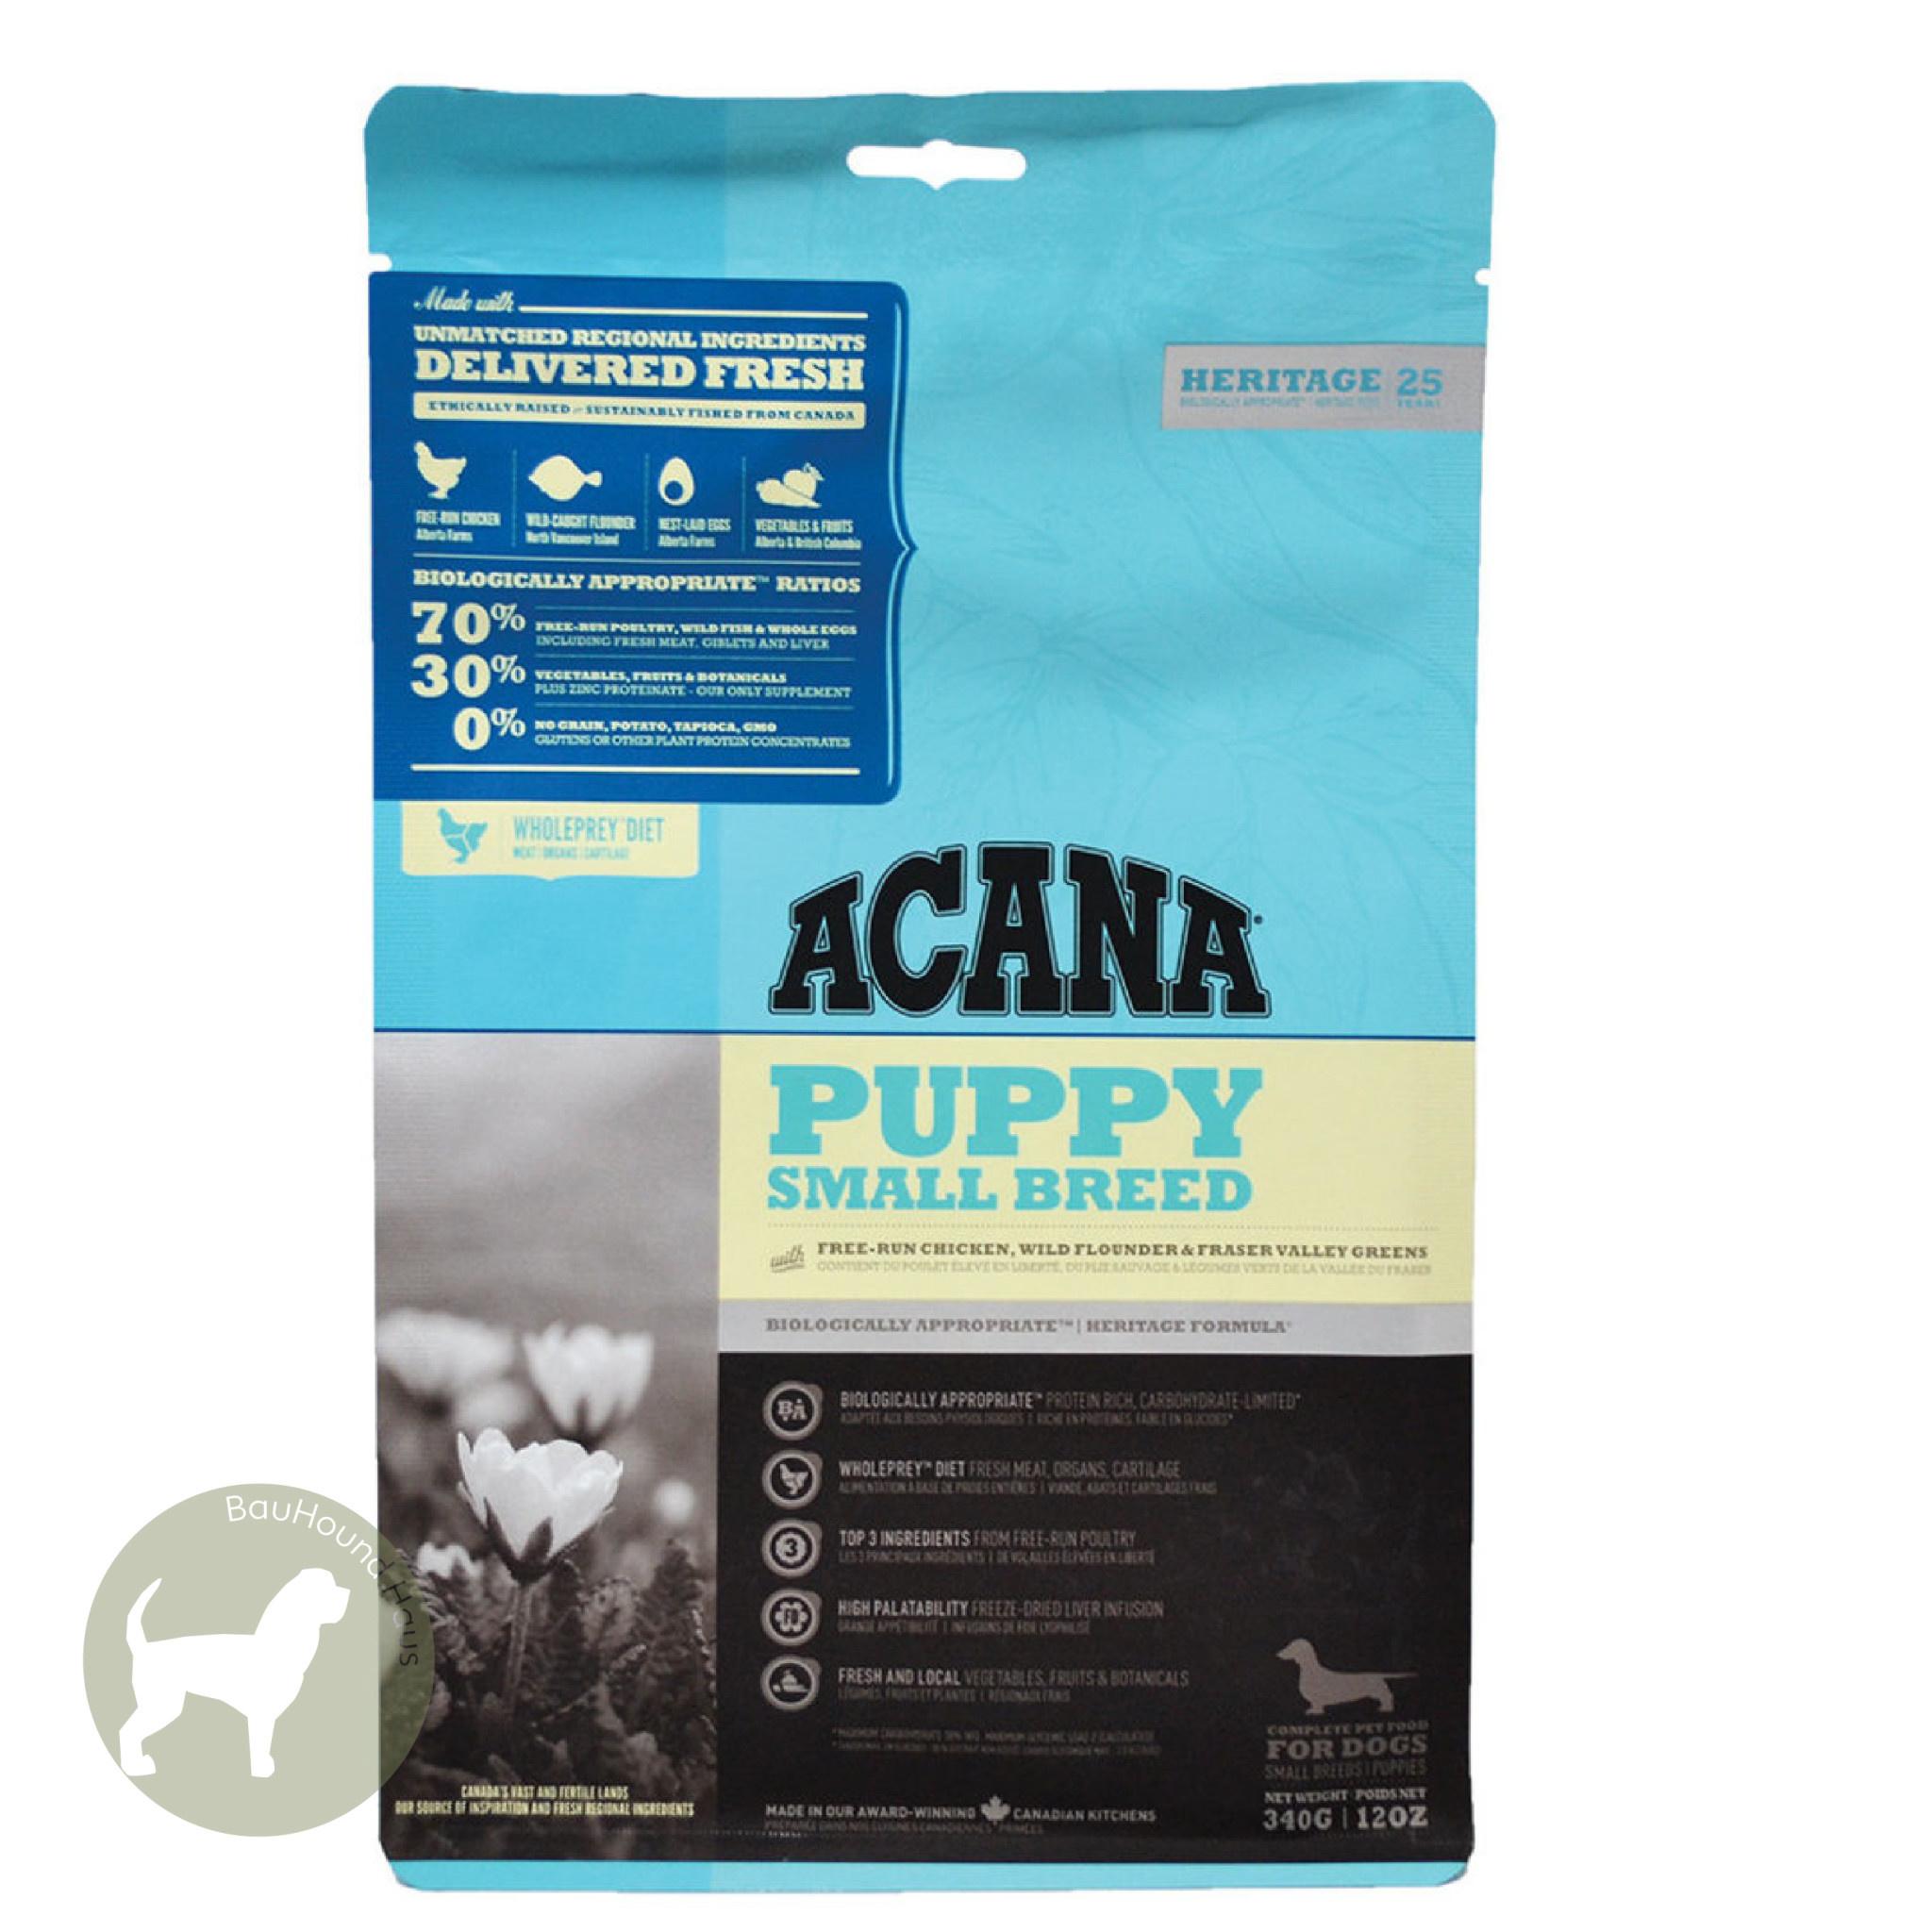 Acana Acana HERITAGE Puppy Small Breed Kibble, 6kg